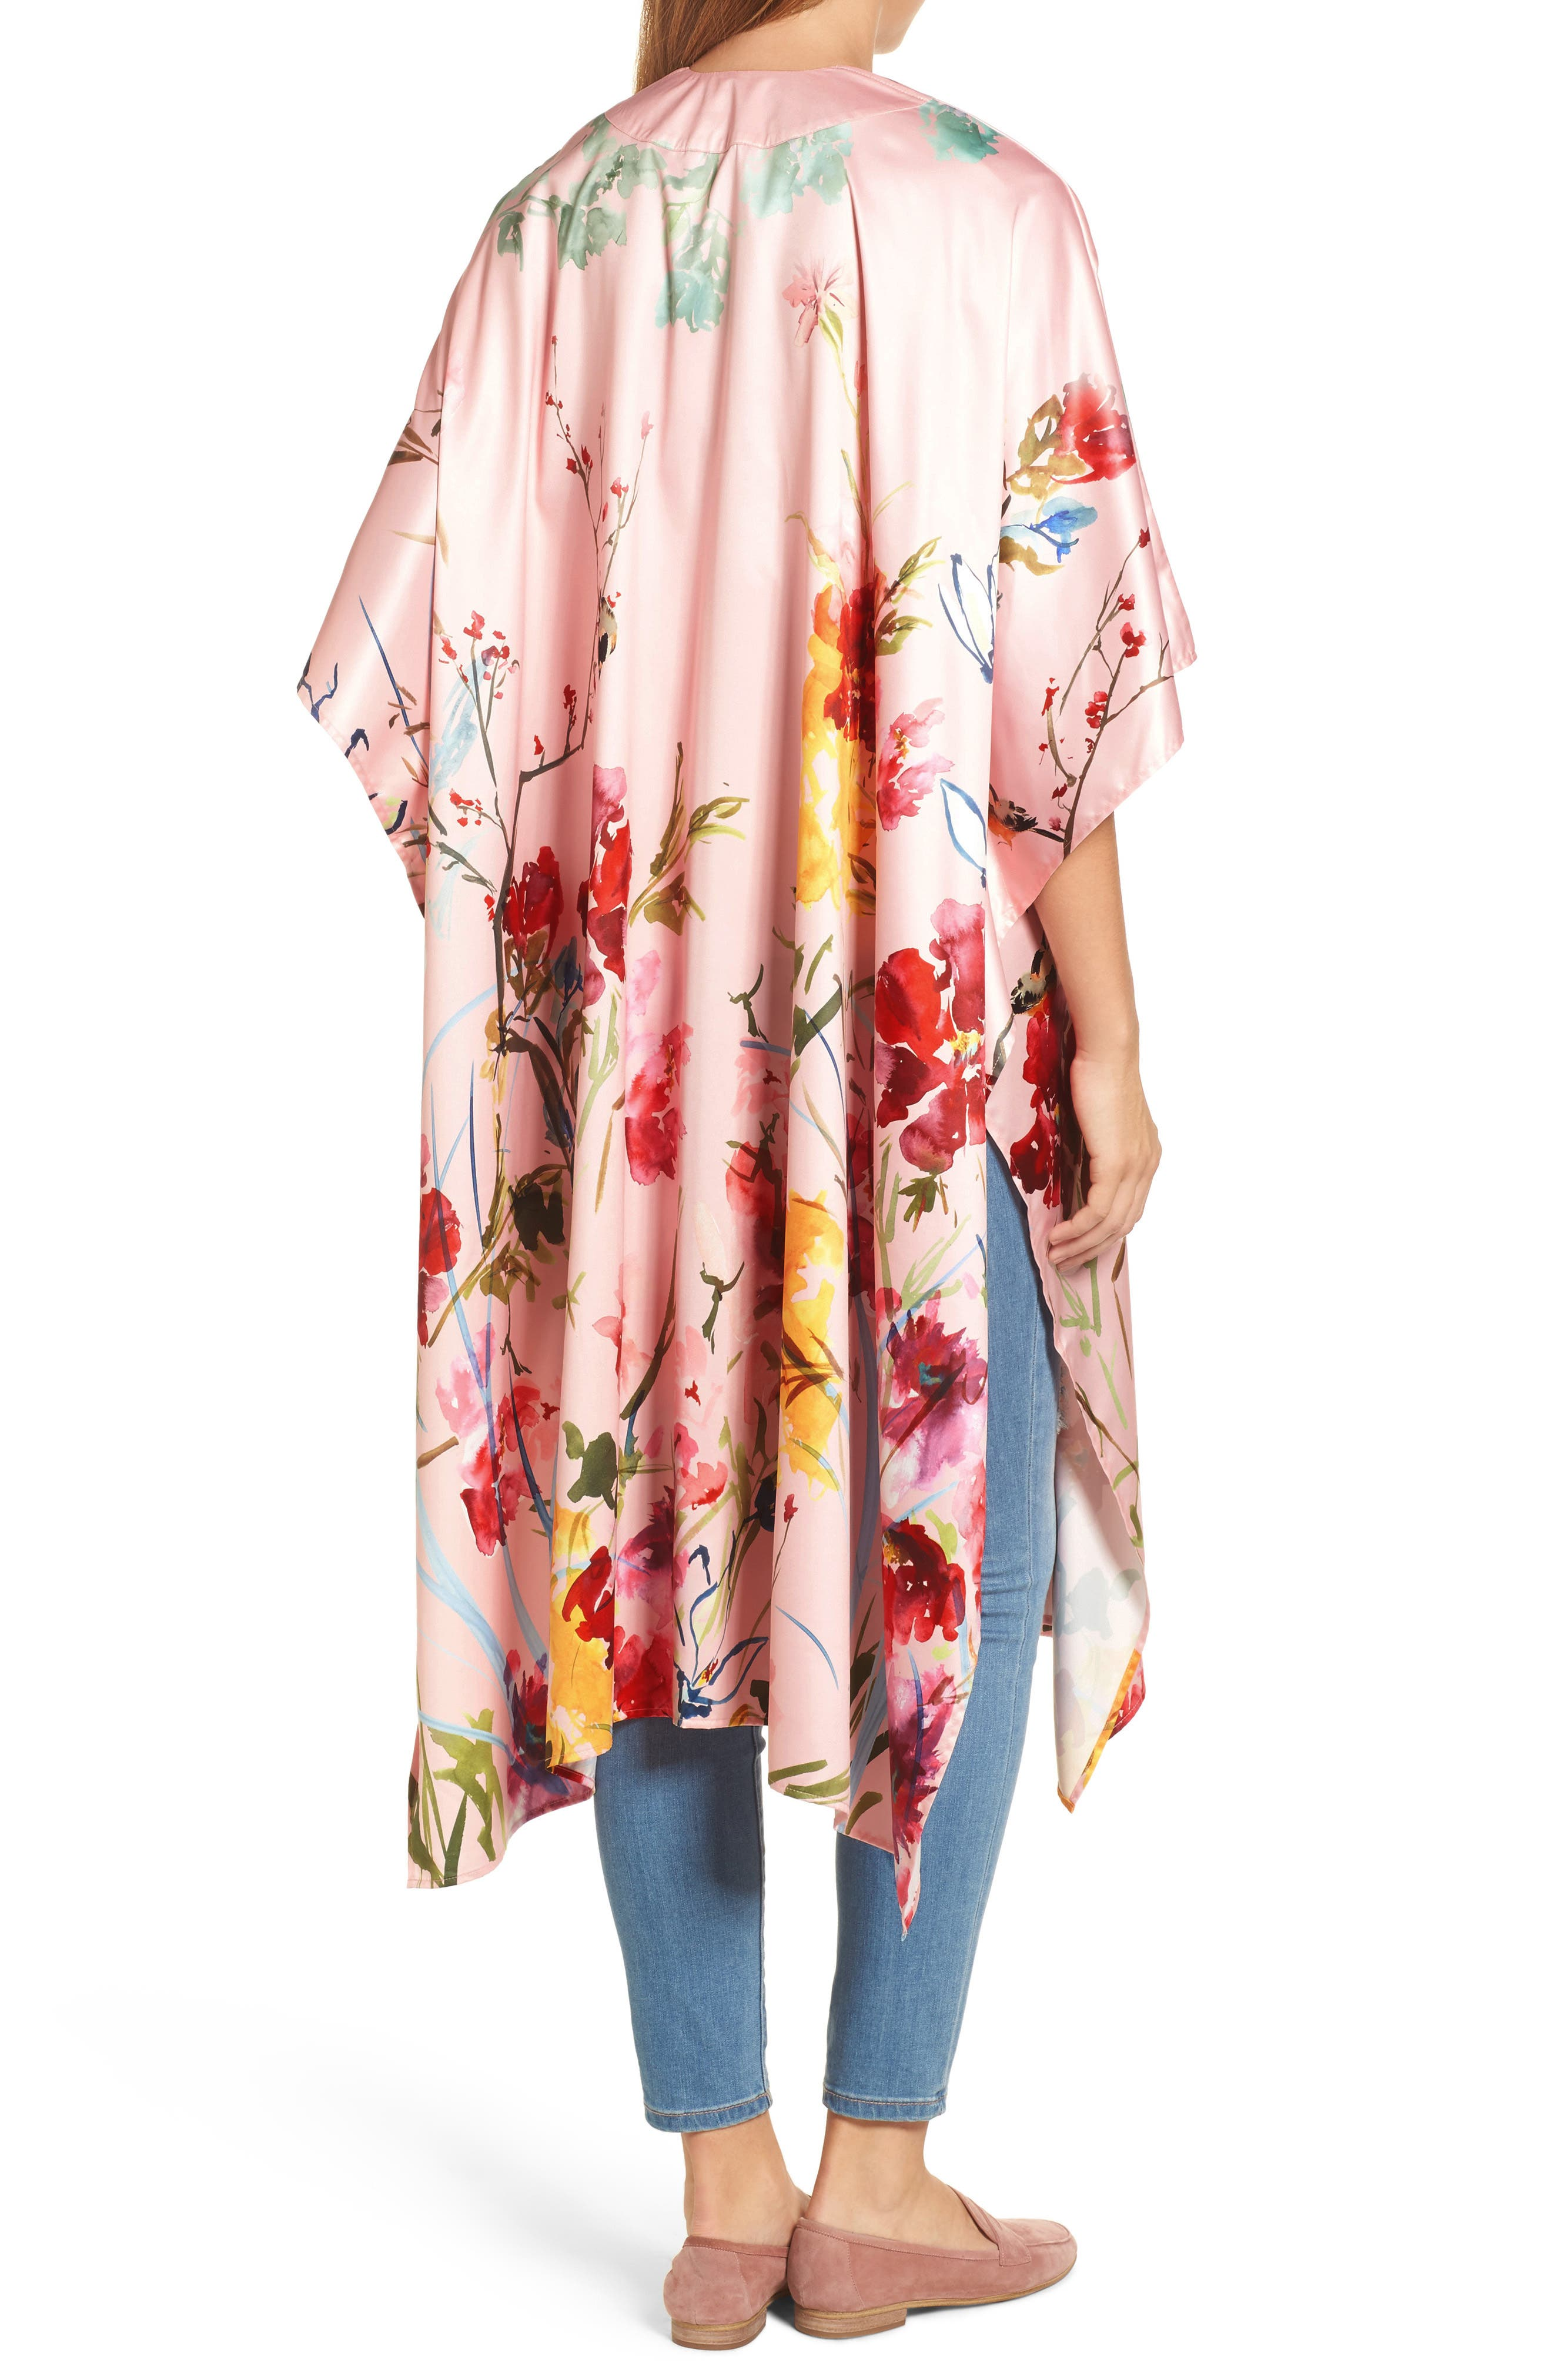 Floral Kimono,                             Alternate thumbnail 2, color,                             Pink Fantasy Garden Print